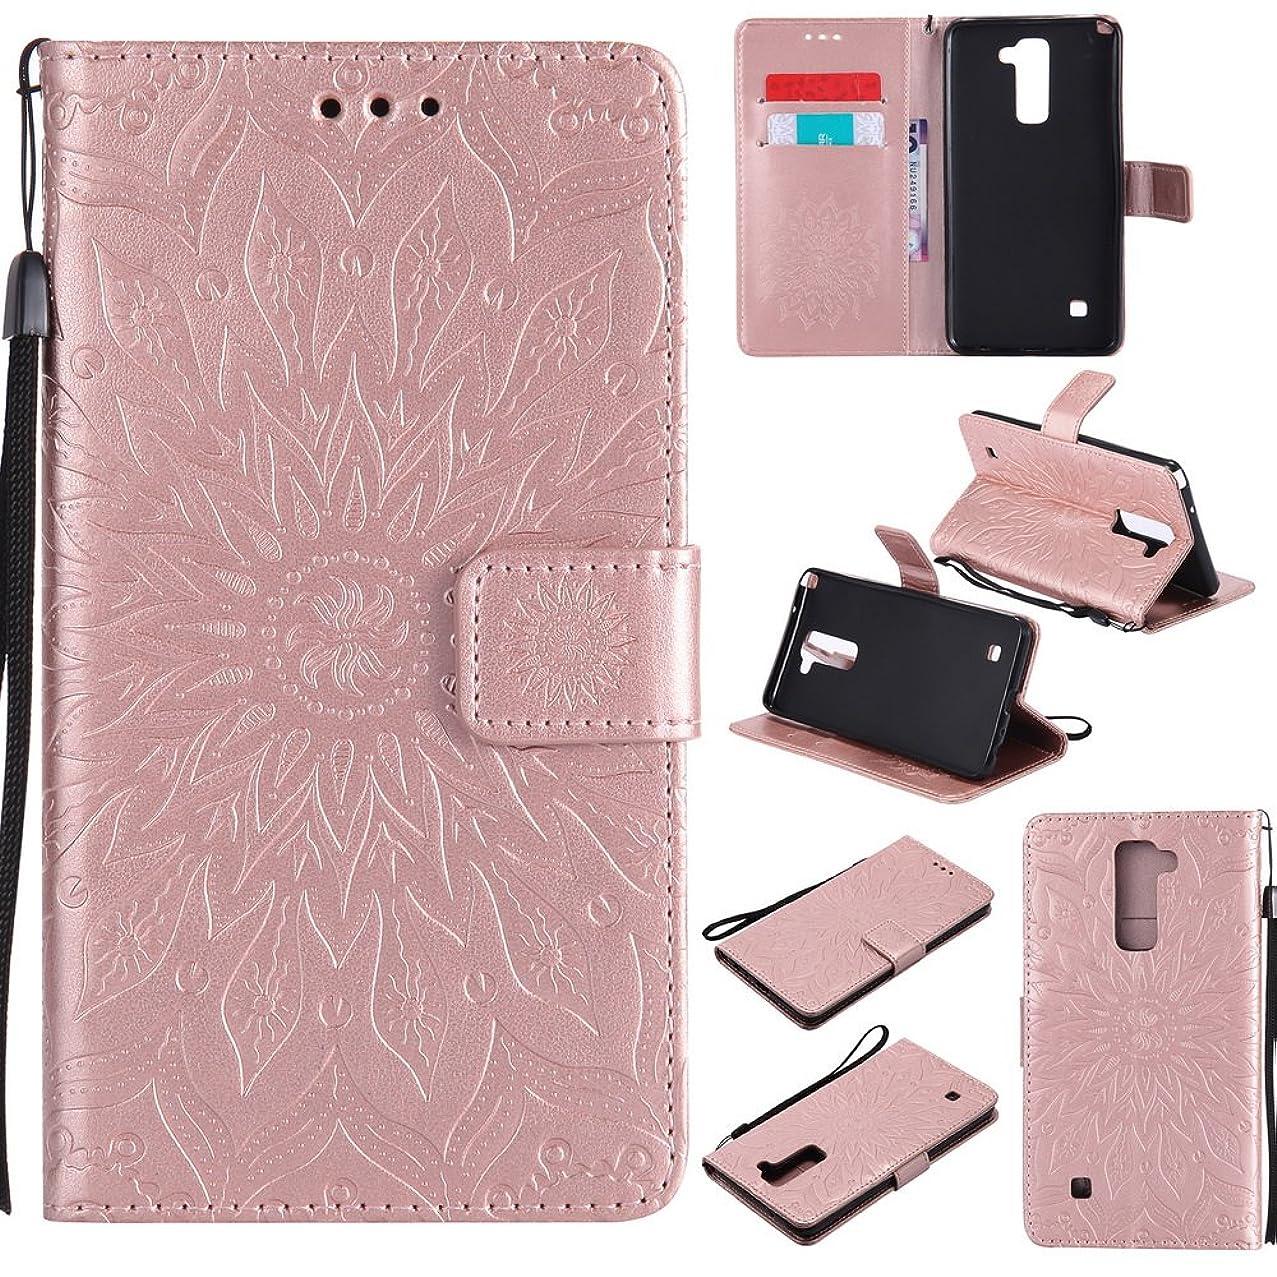 NEXCURIO [Embossed Flower] LG Stylo 2 / Stylo 2 Plus/Stylo 2 V Wallet Case with Card Holder Folding Kickstand Leather Case Flip Cover for LG Stylo 2 / Stylo 2 V (Rose Gold)